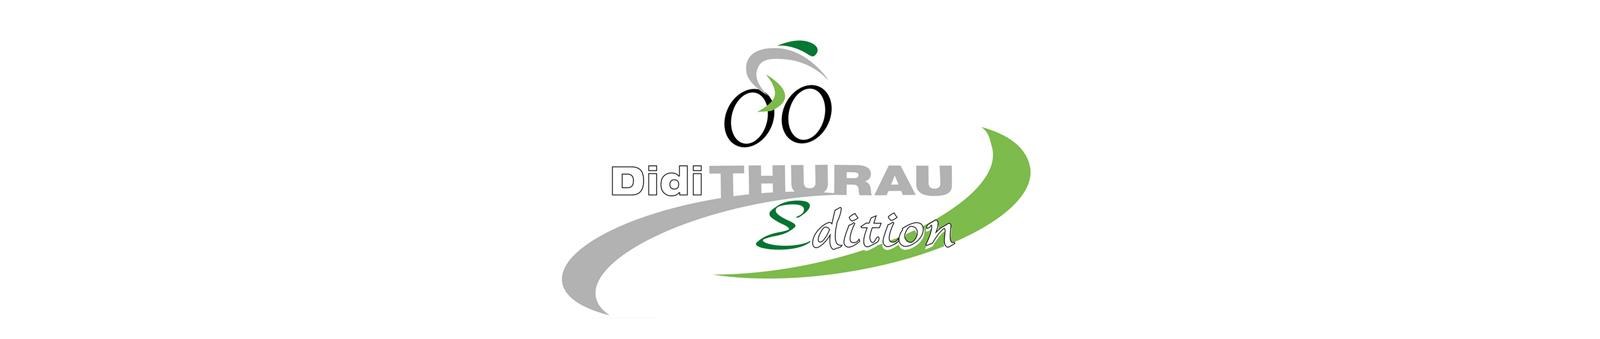 Didi Thurau Edition